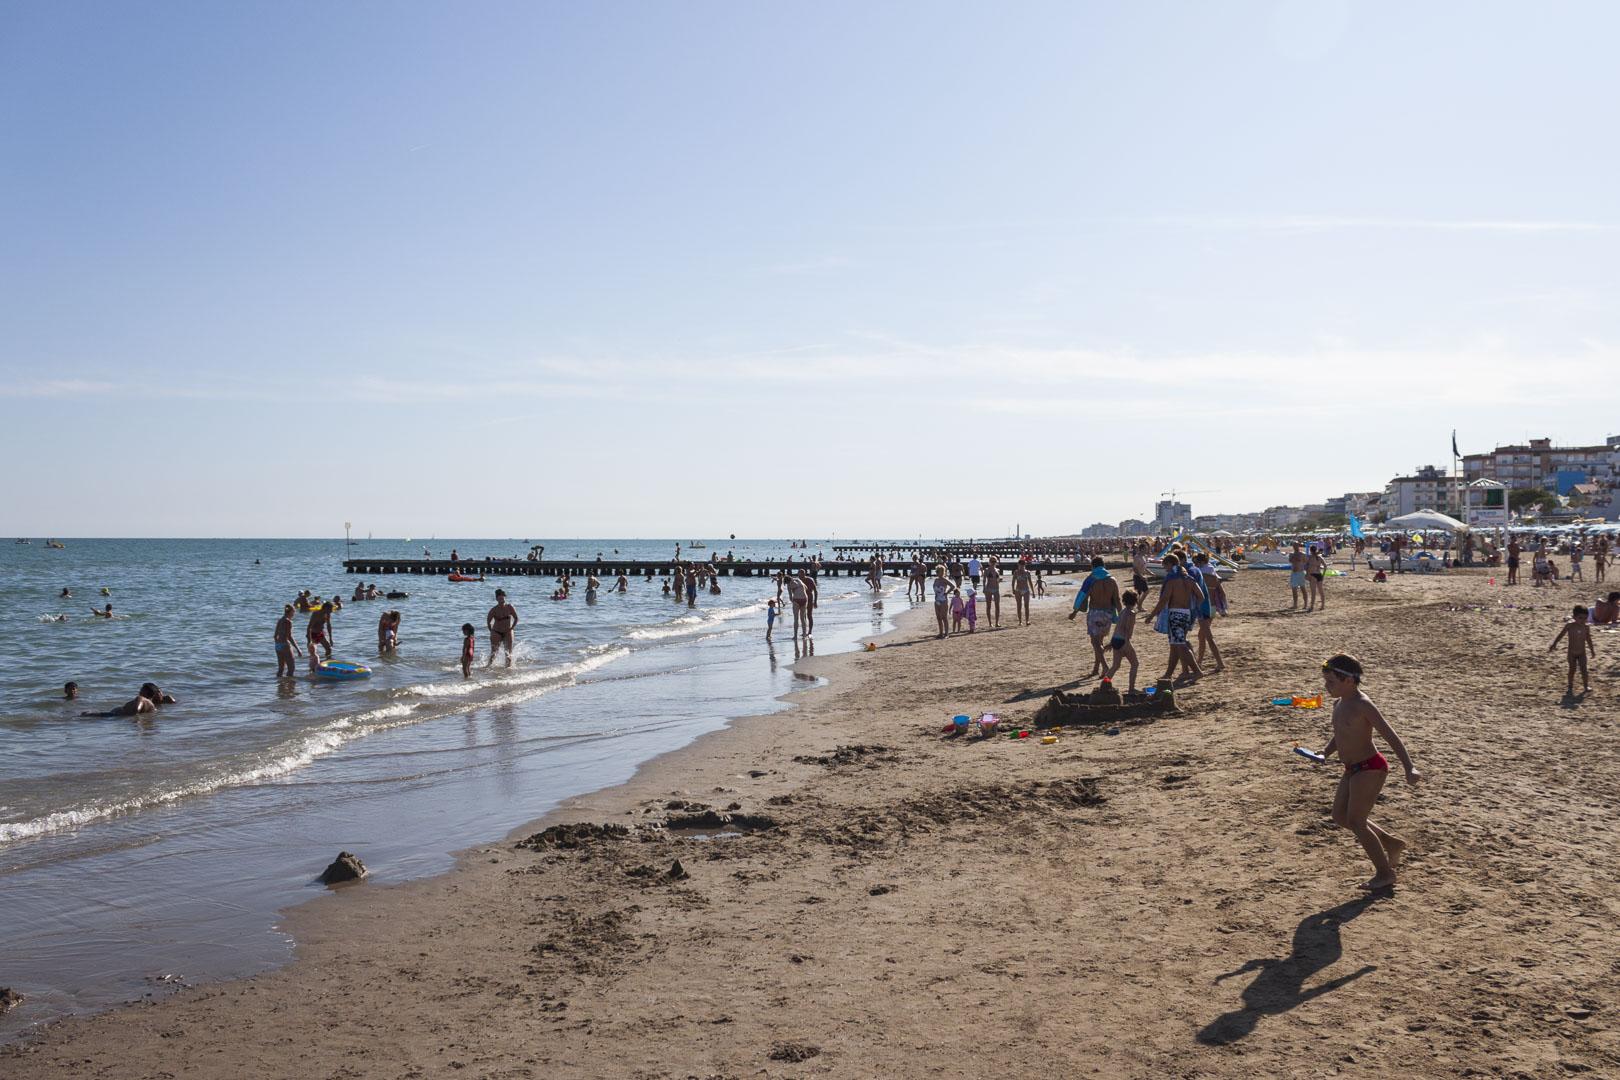 Lido Beach Italy Hotels